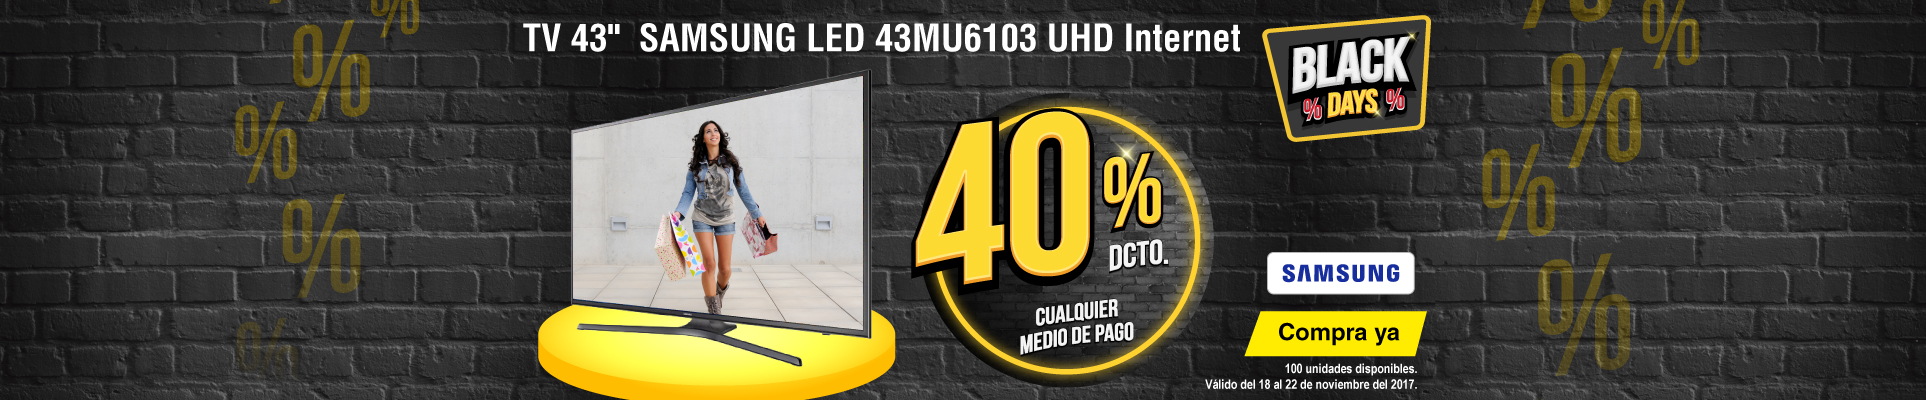 CAT ALKP-3-tv-tTV 43 108cm SAMSUNG LED 43MU6103 UHD Internet-prod-noviembre22